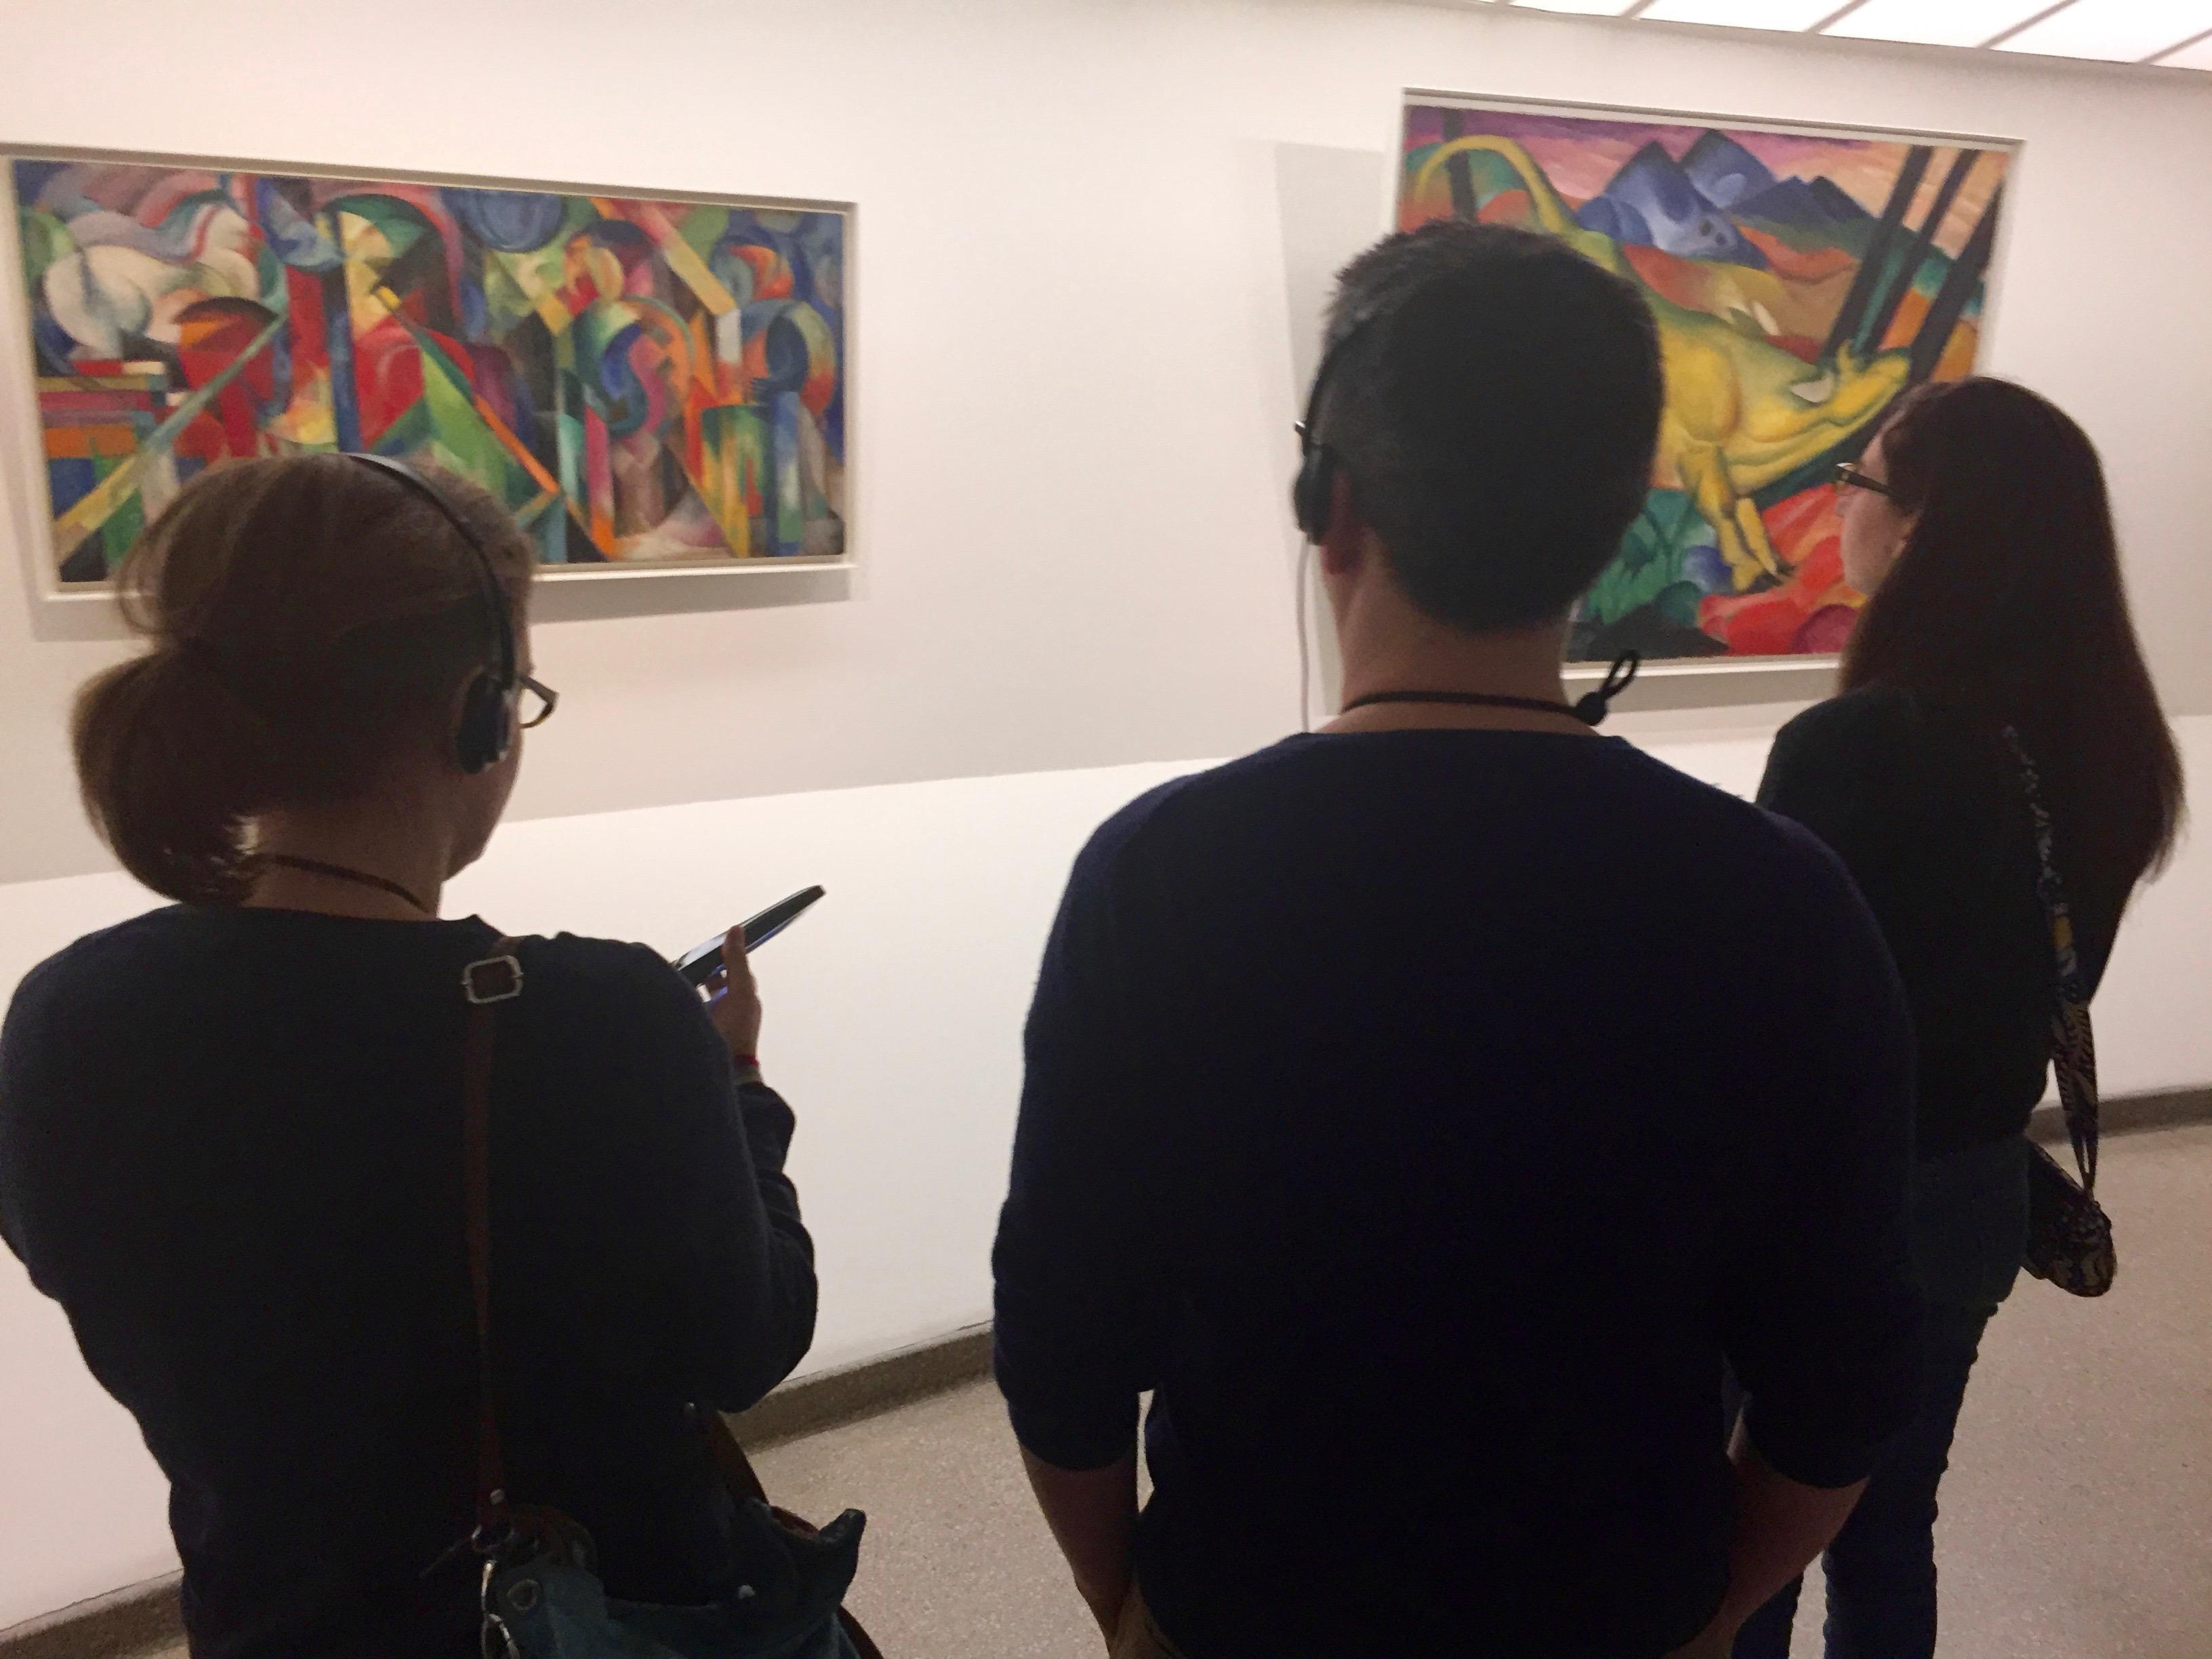 Visionaries: Creating a Modern Guggenheim